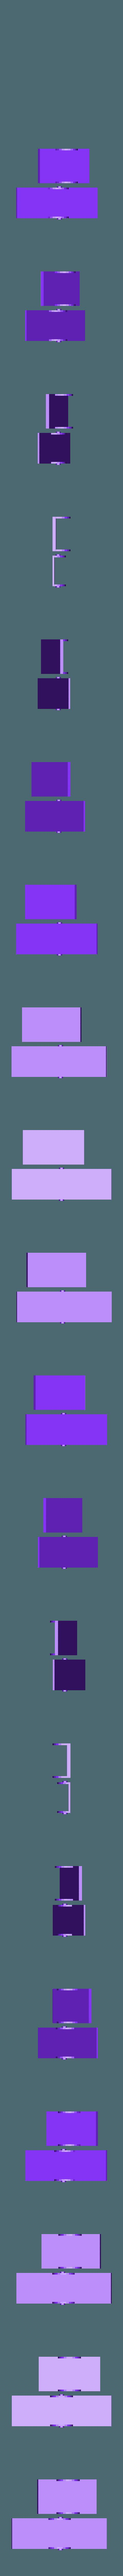 Mausschaukel_Ober- und Unterteil.stl Download free STL file Mouse Slide • 3D print template, pullrich